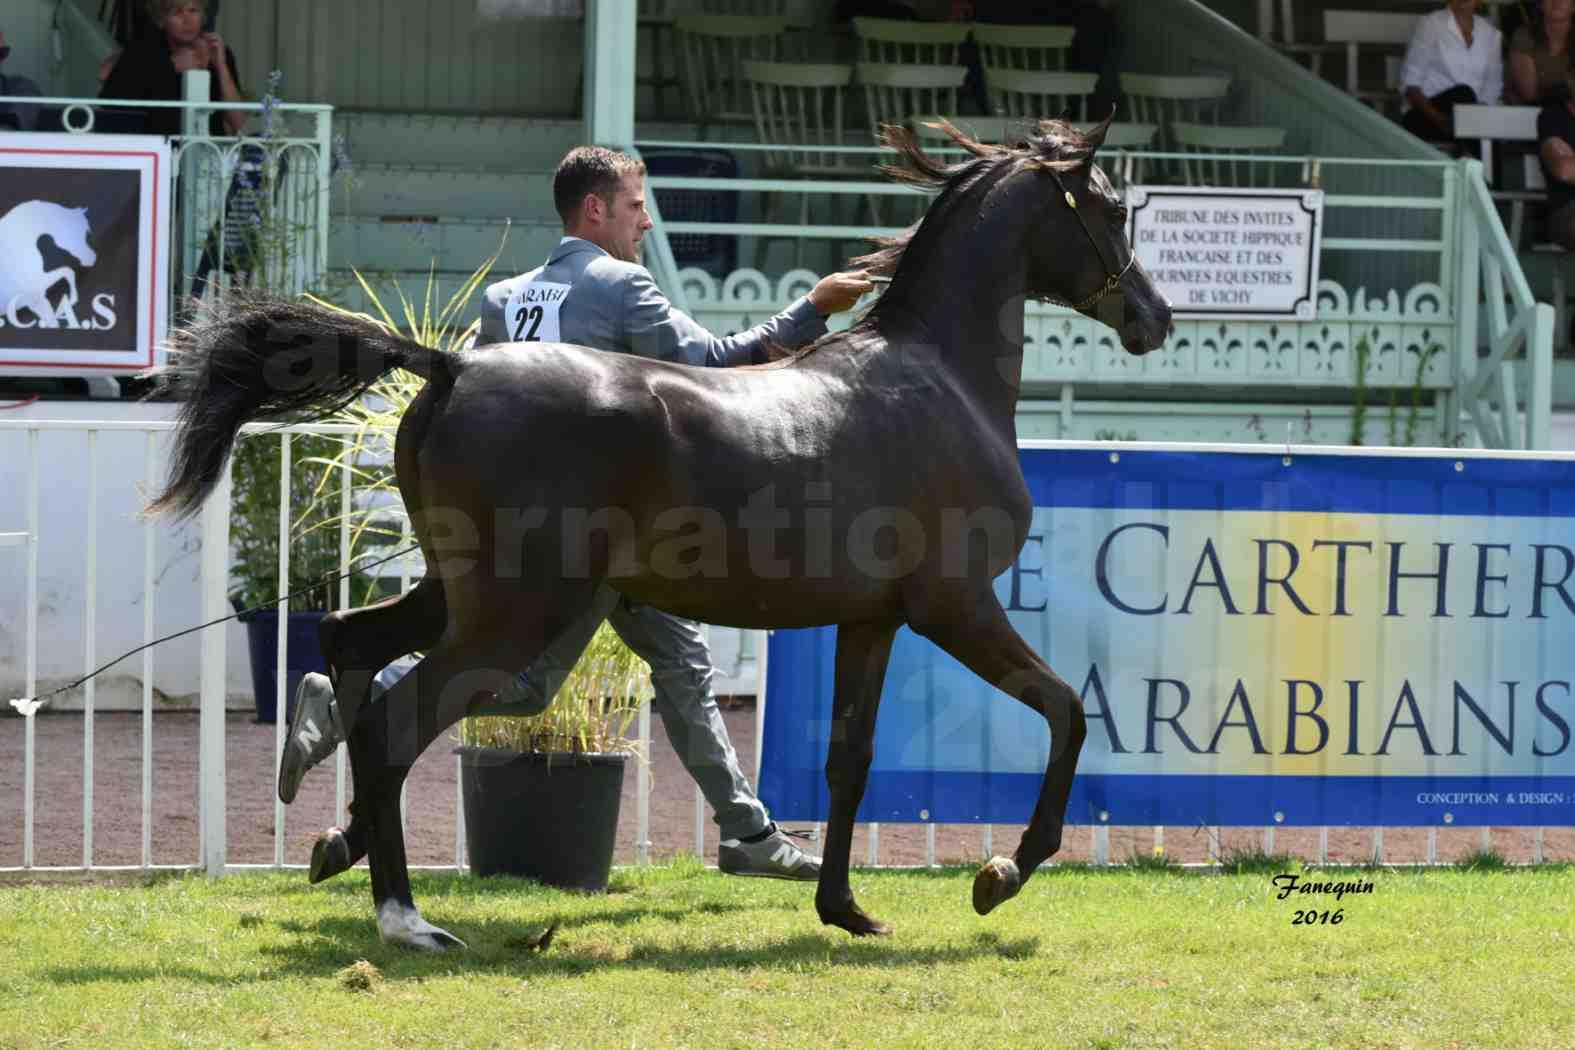 International Arabian Horse Show B de VICHY 2016 - ANNALISA ALIH - Notre Sélection - 4